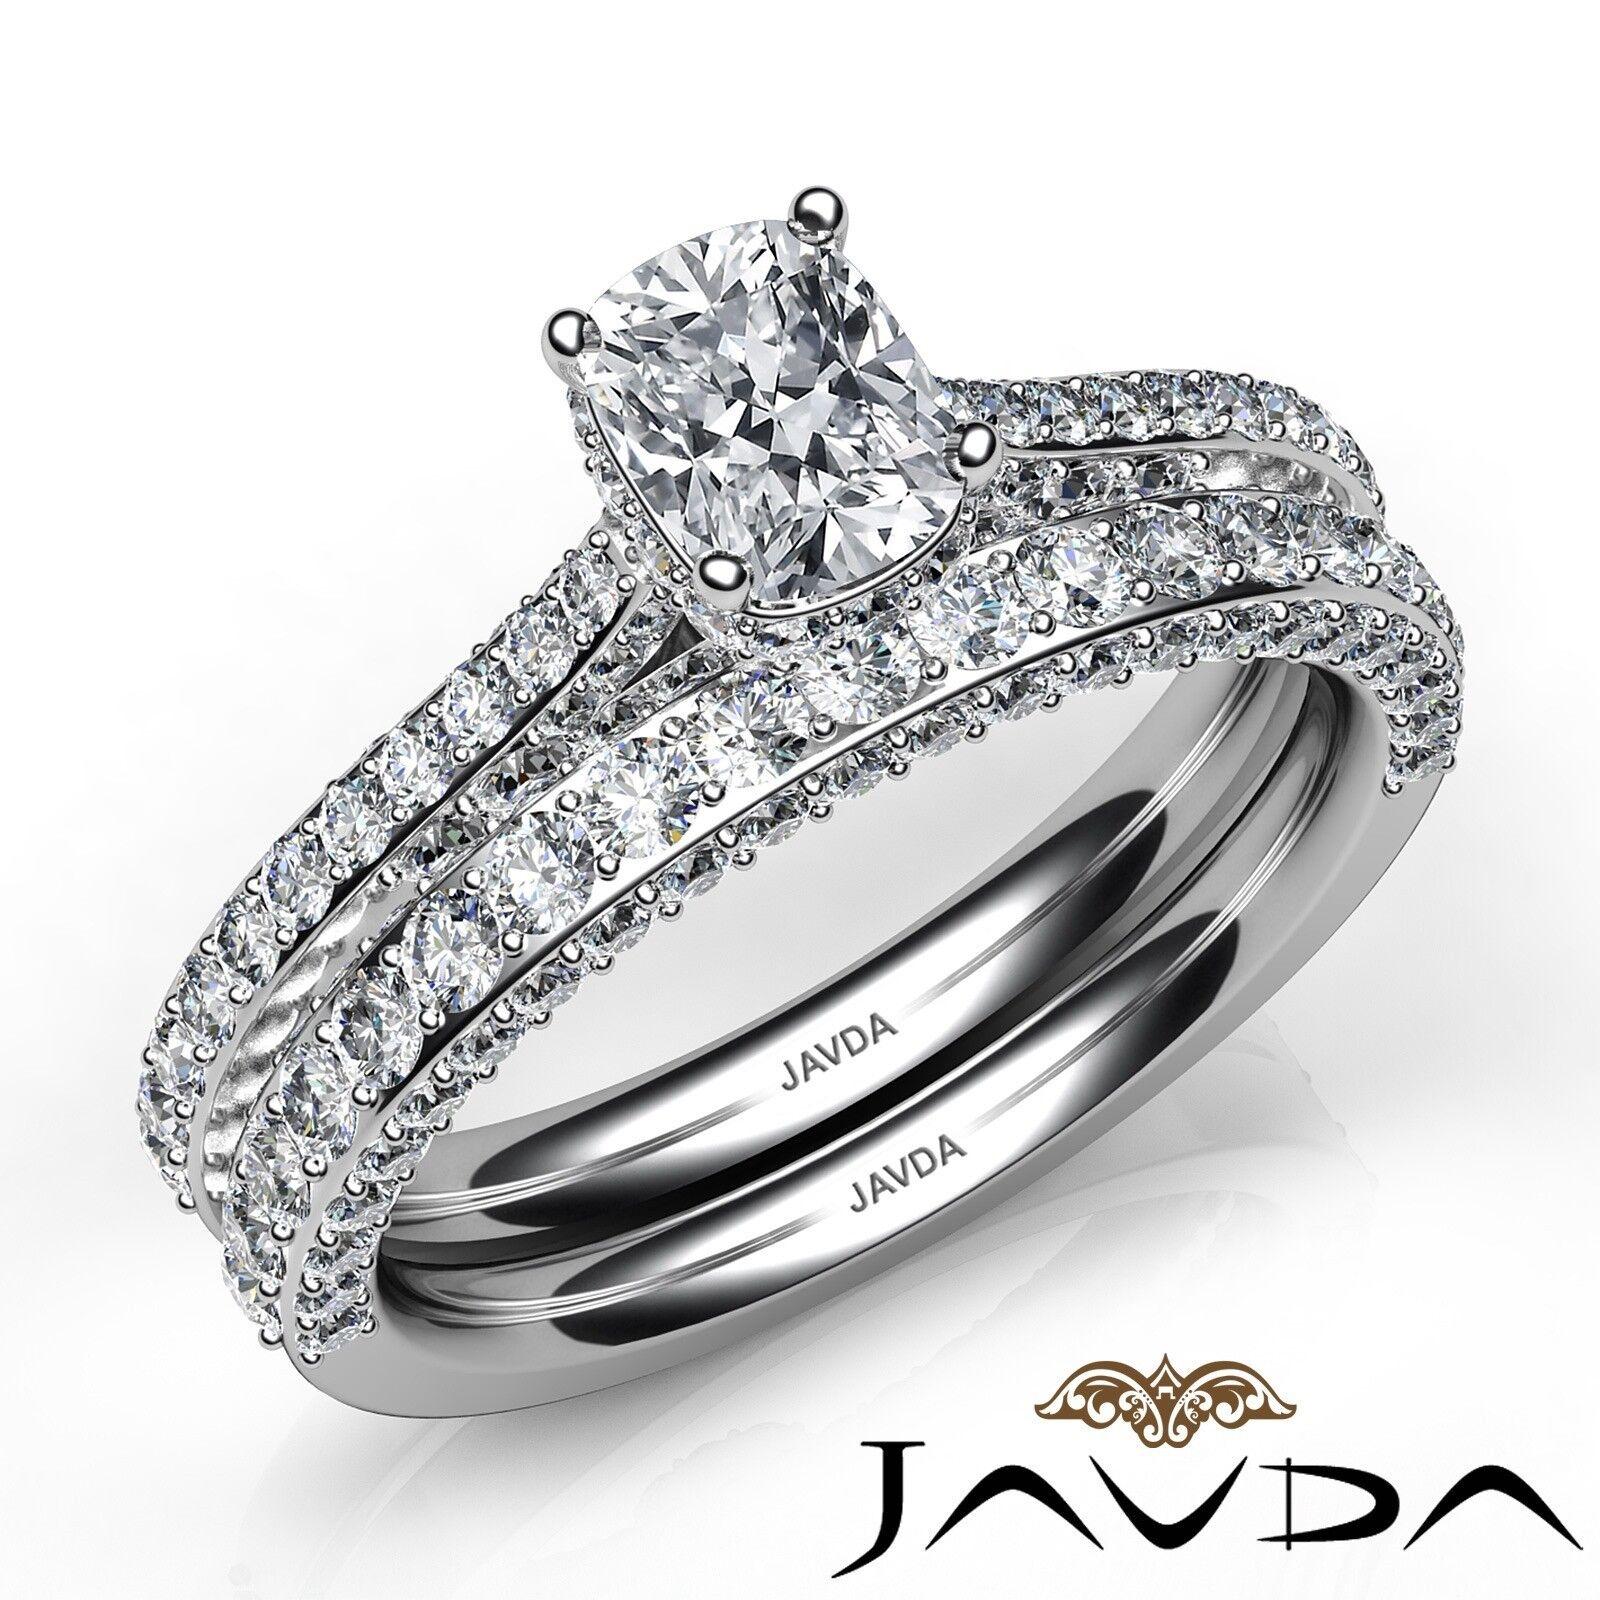 2.85ctw Pave Circa Halo Bridal Cushion Diamond Engagement Ring GIA F-VS1 W Gold 1